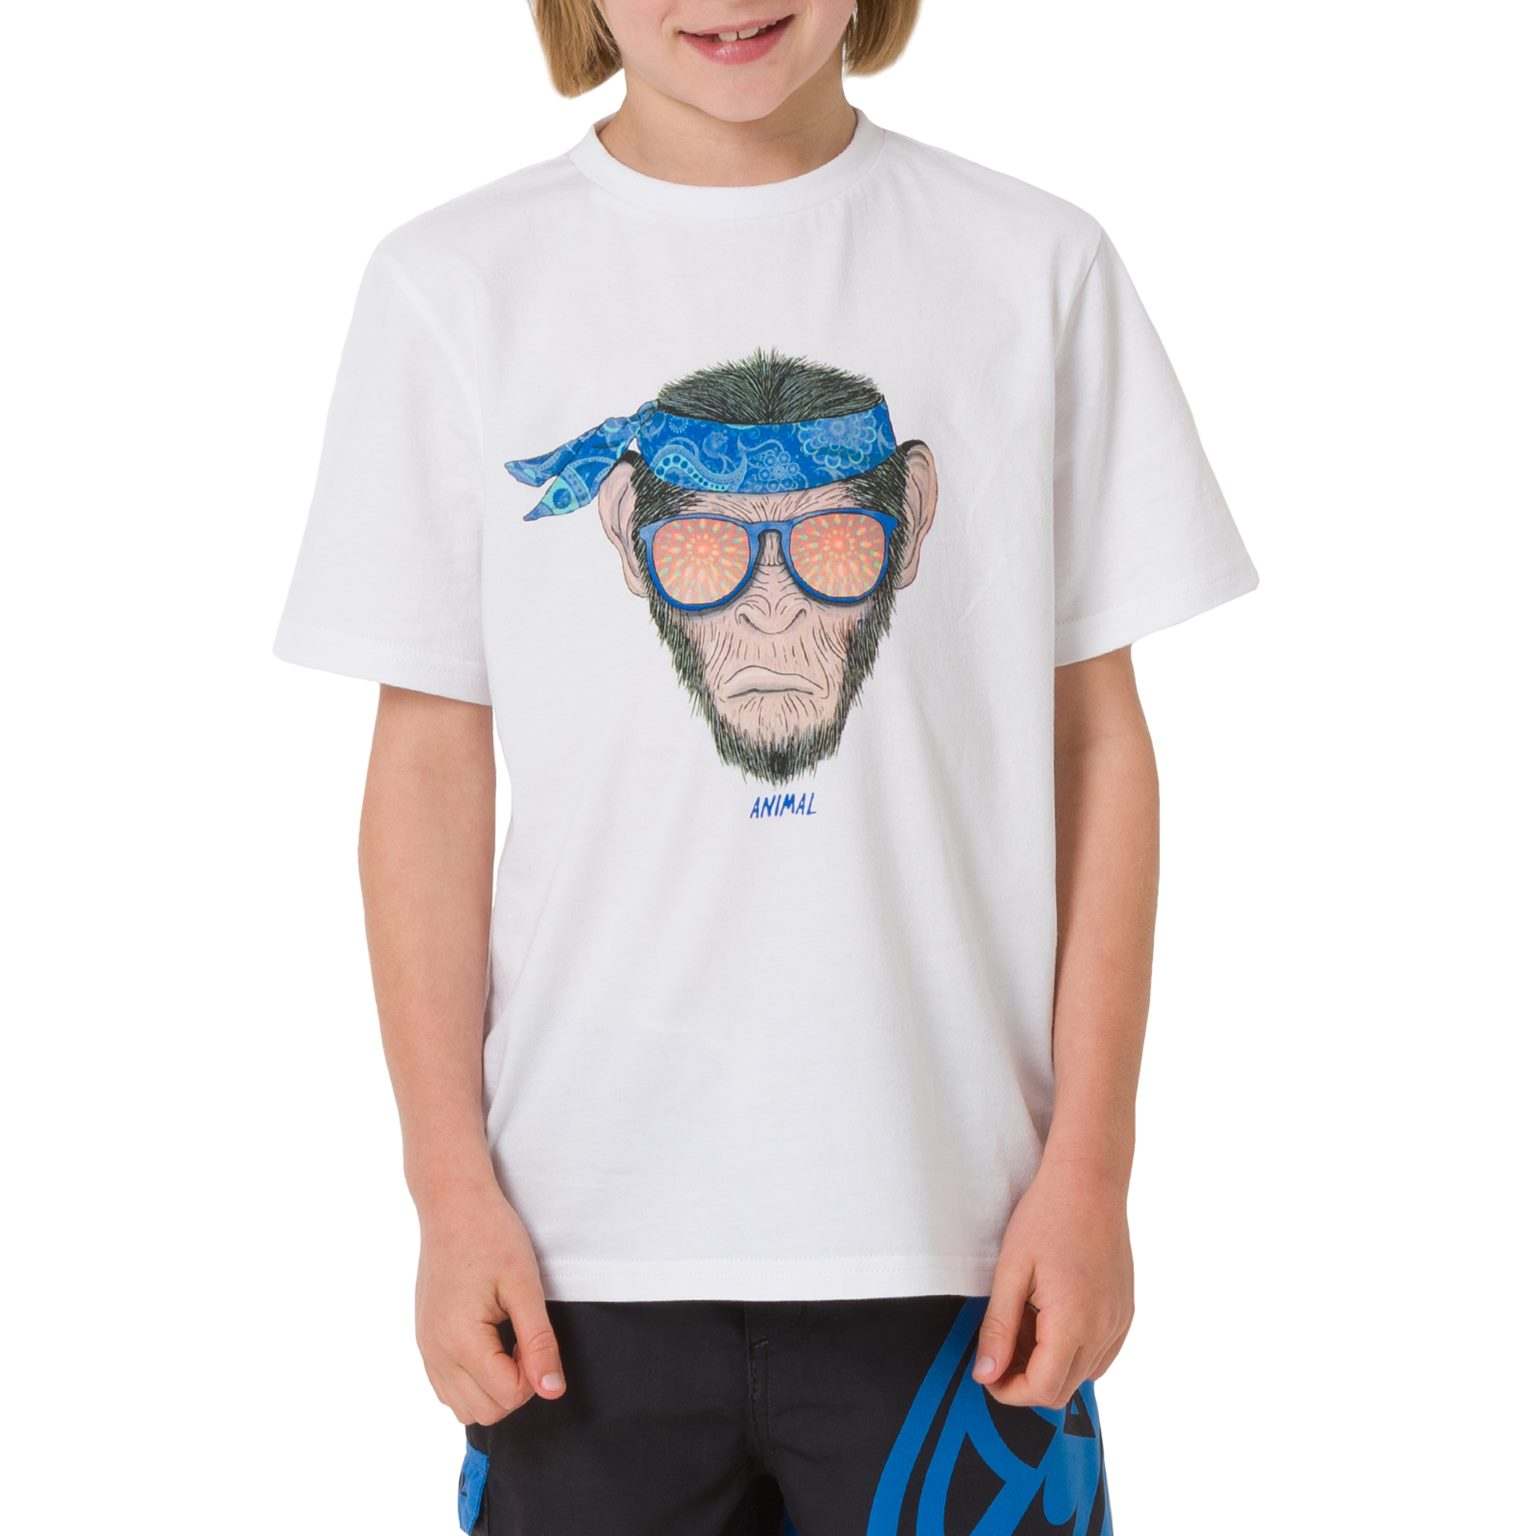 Animal Boys Kids Hendrix Short Sleeve Crew Neck Casual Cotton T-Shirt Tee Top